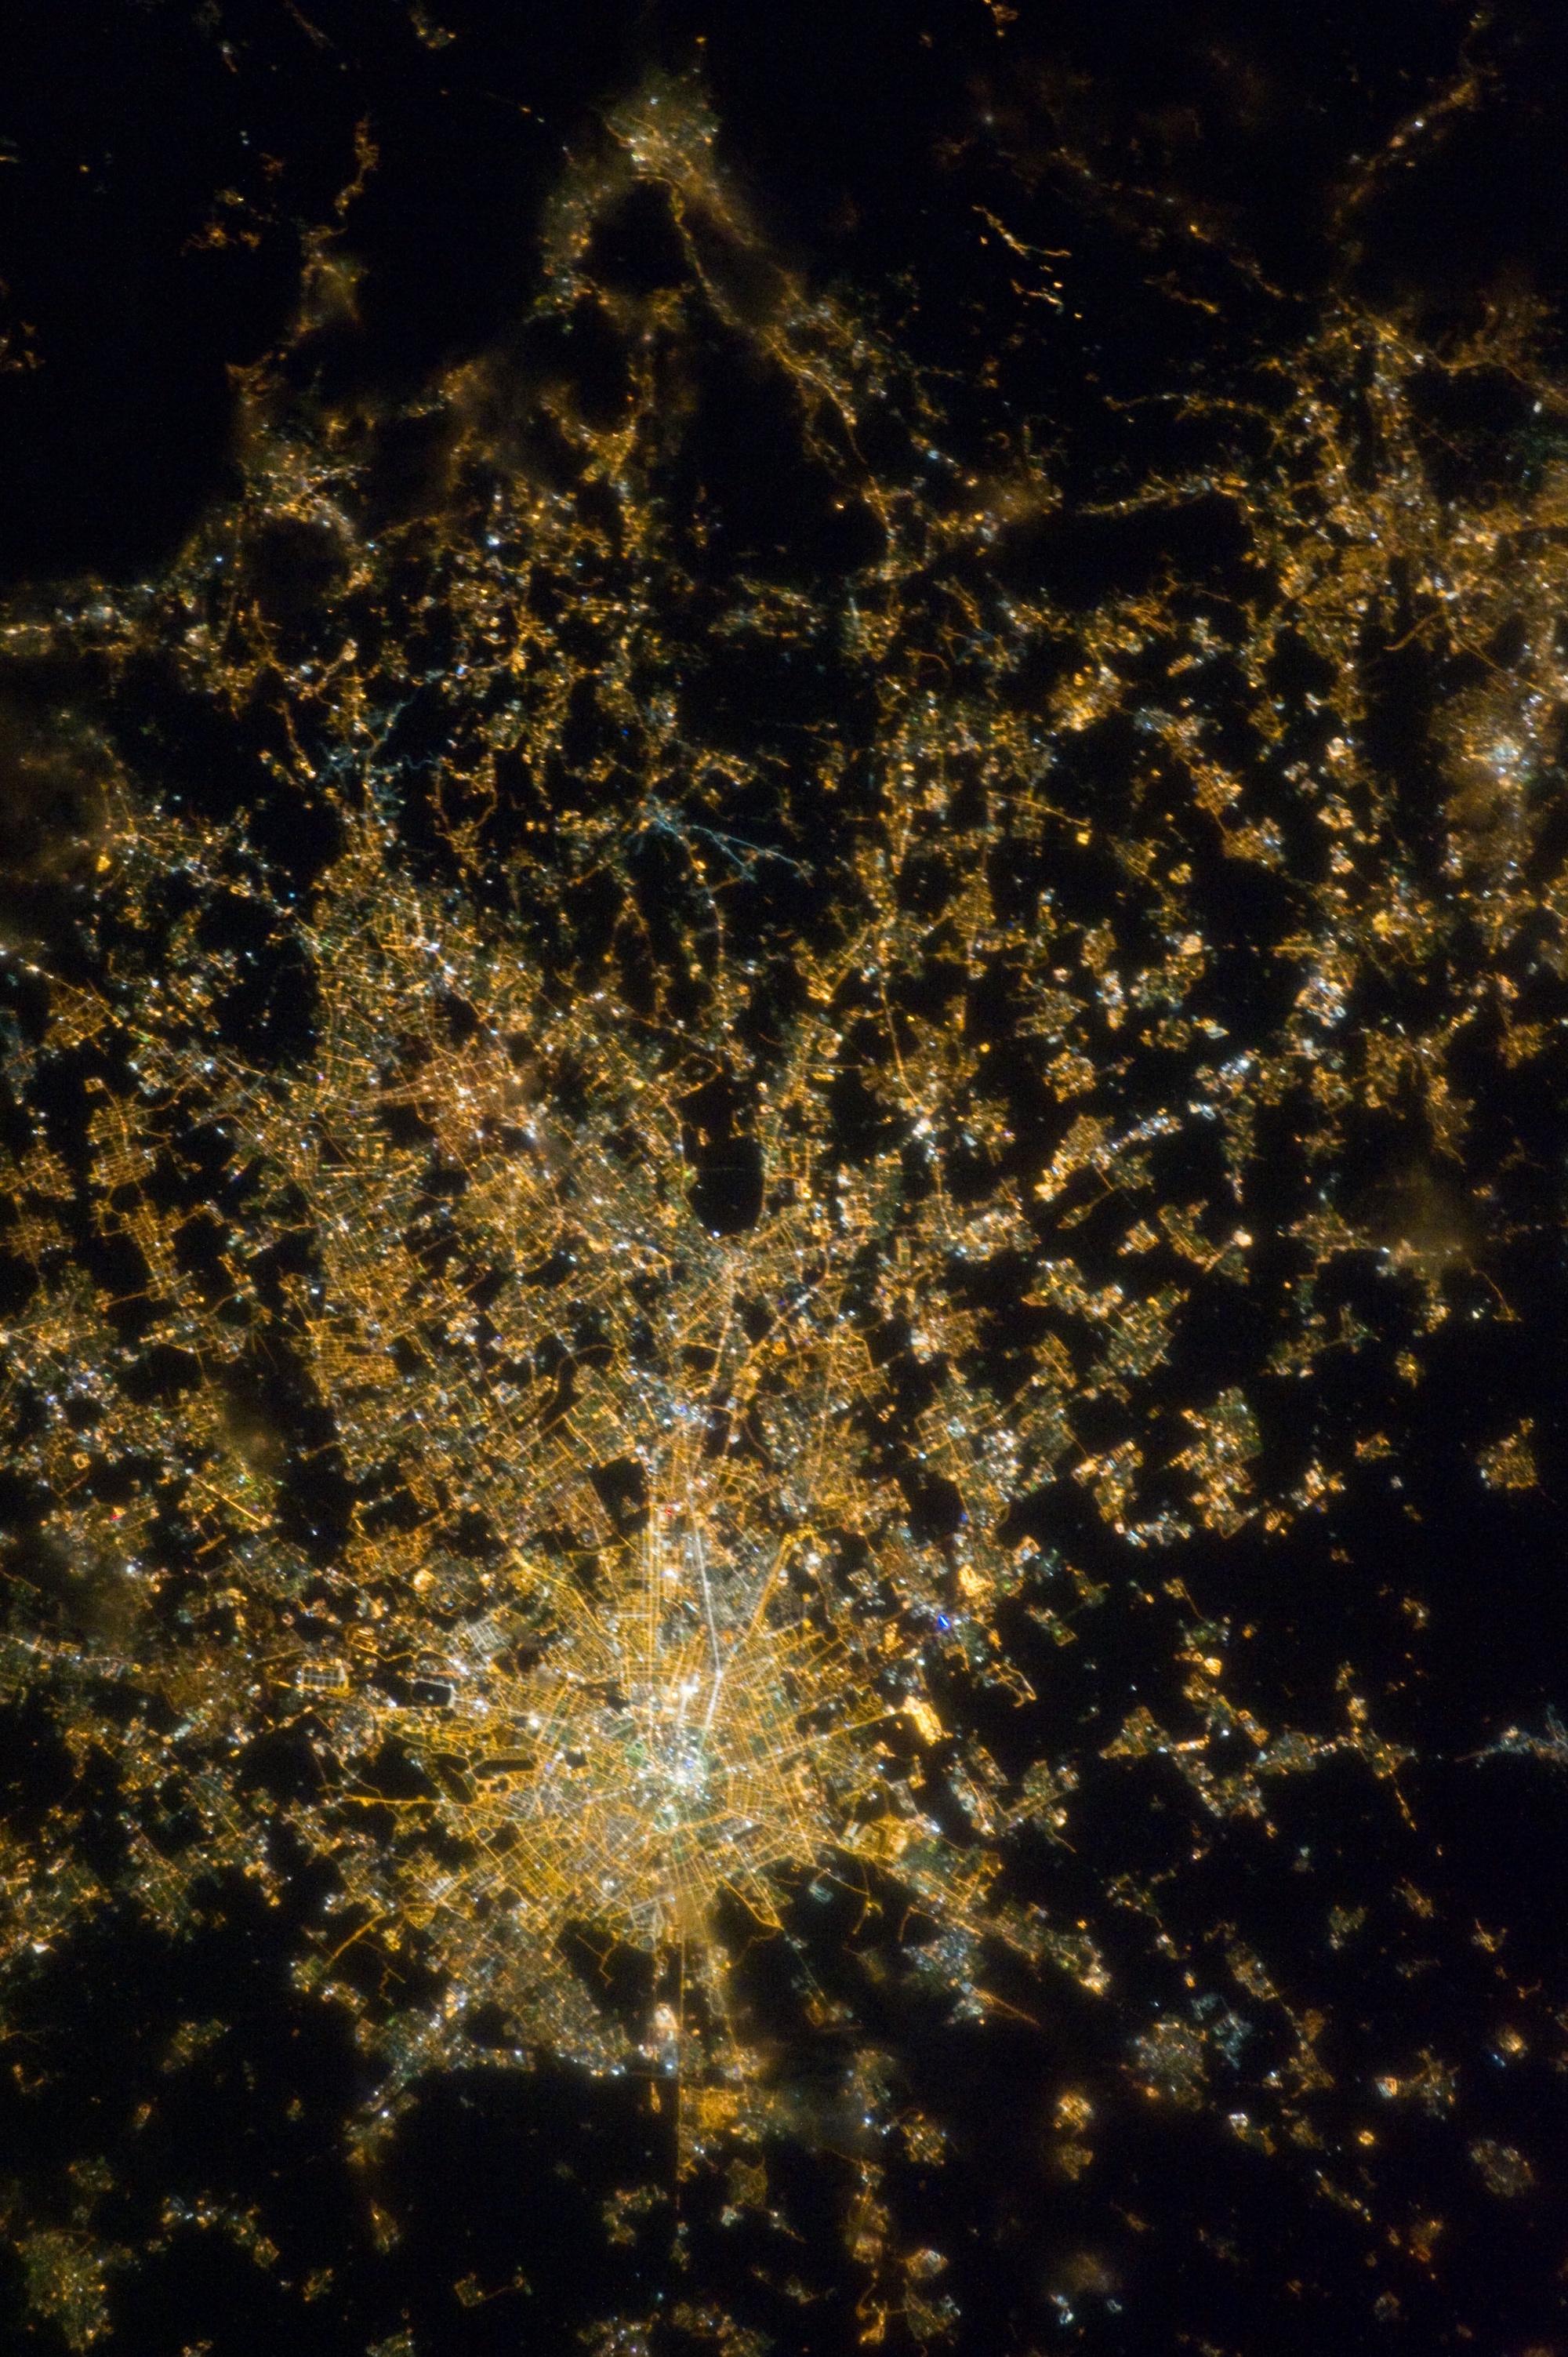 Italie - Milan la nuit